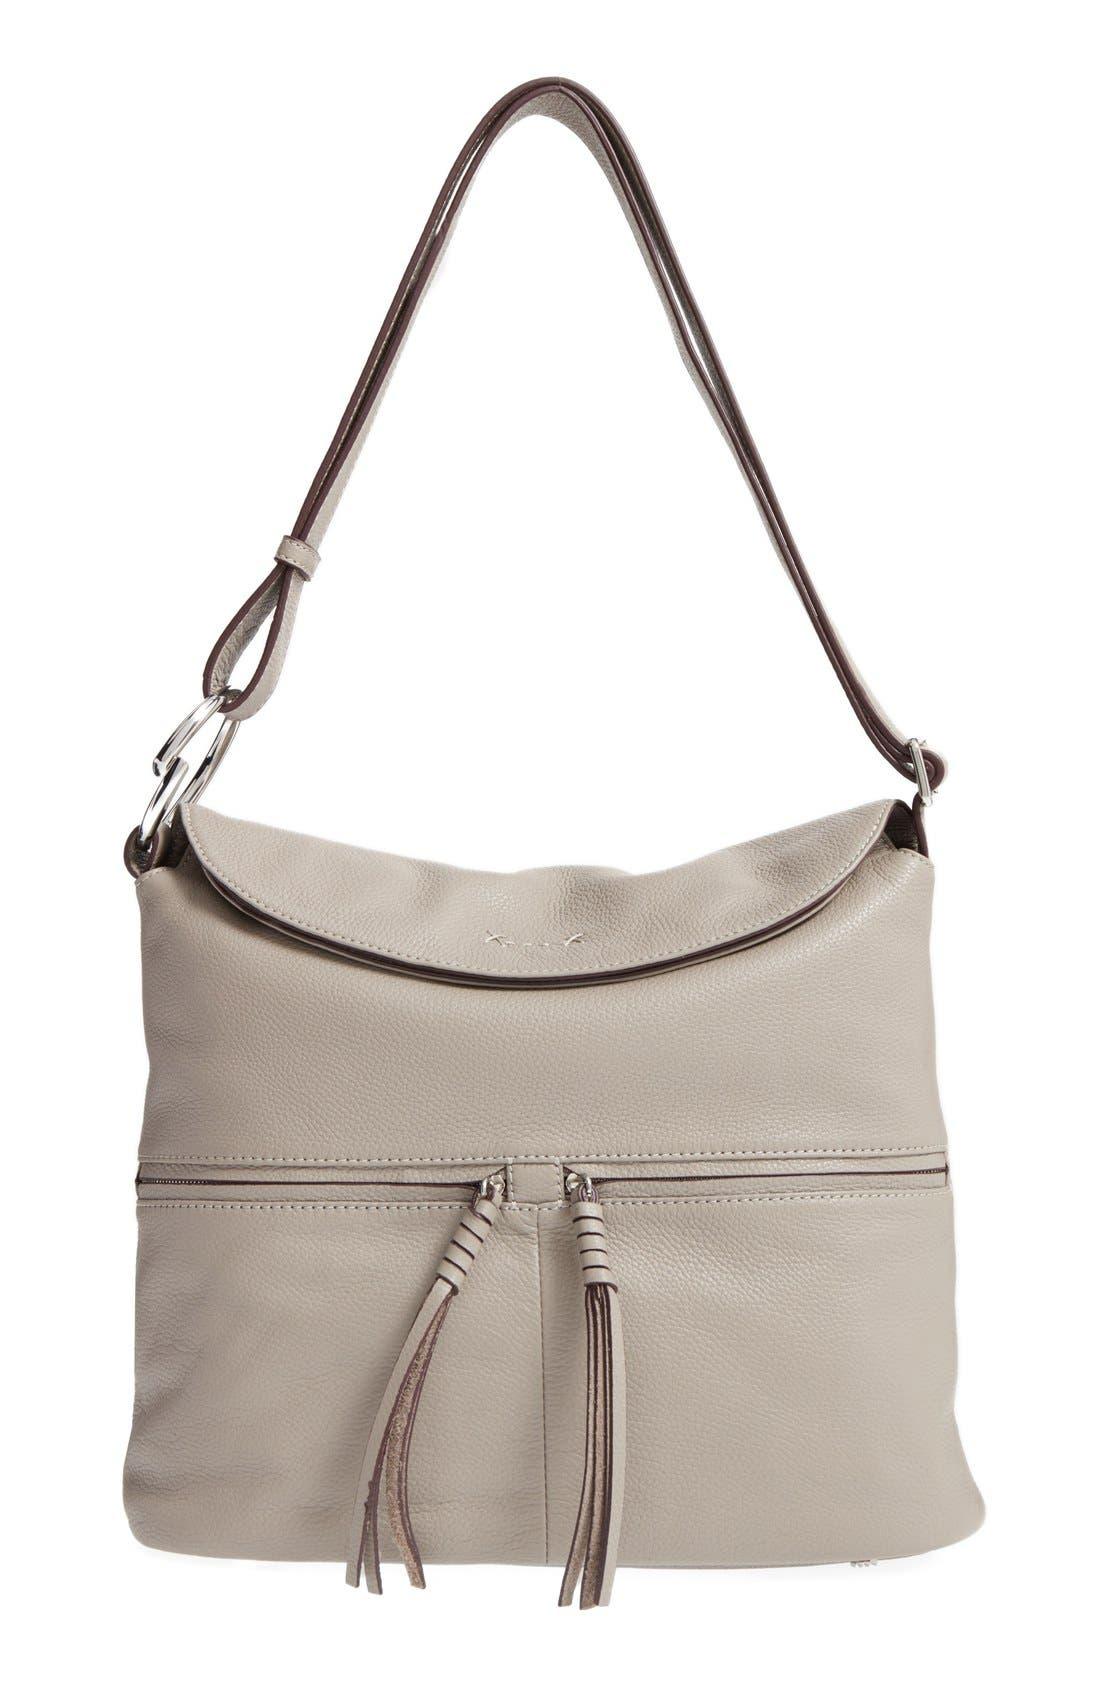 Main Image - Elizabeth and James Finley Leather Hobo Bag